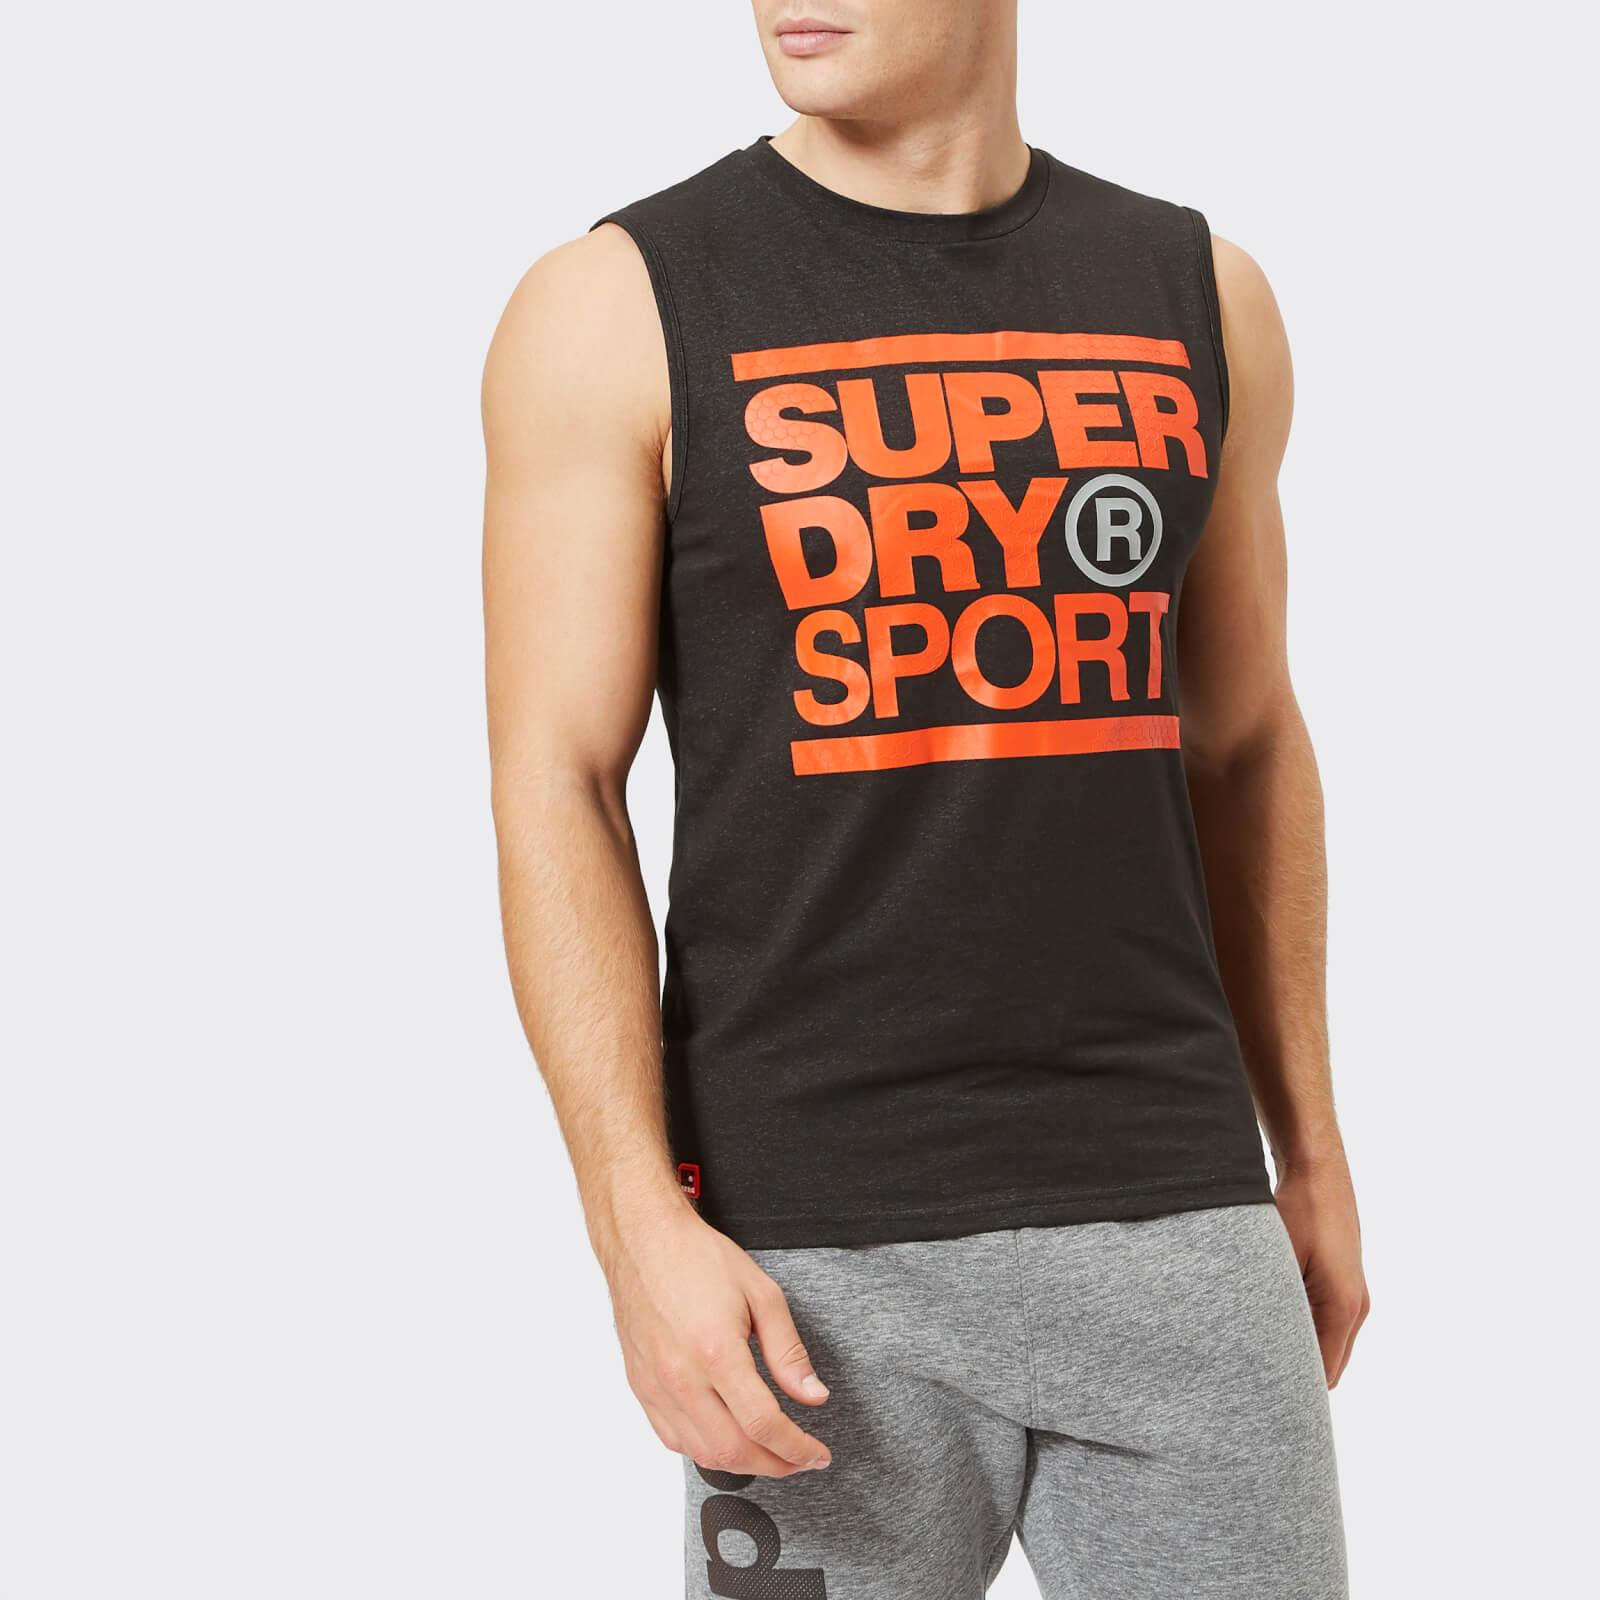 Superdry Sport Men's Core Graphic Tank Top - Black - S - Black